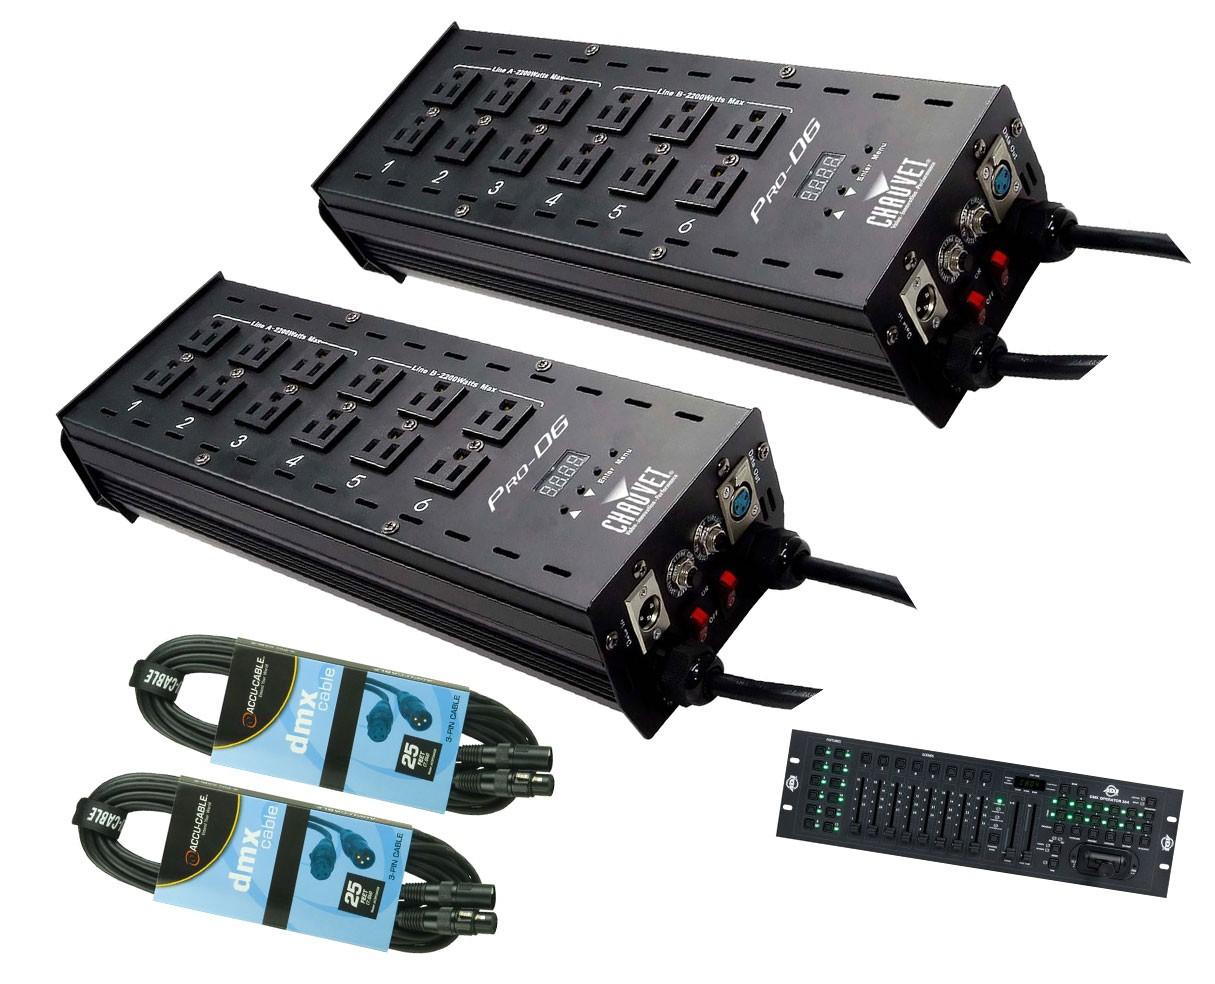 2x CHAUVET DJ Pro-D6 + DMX Operator 384 + Cables